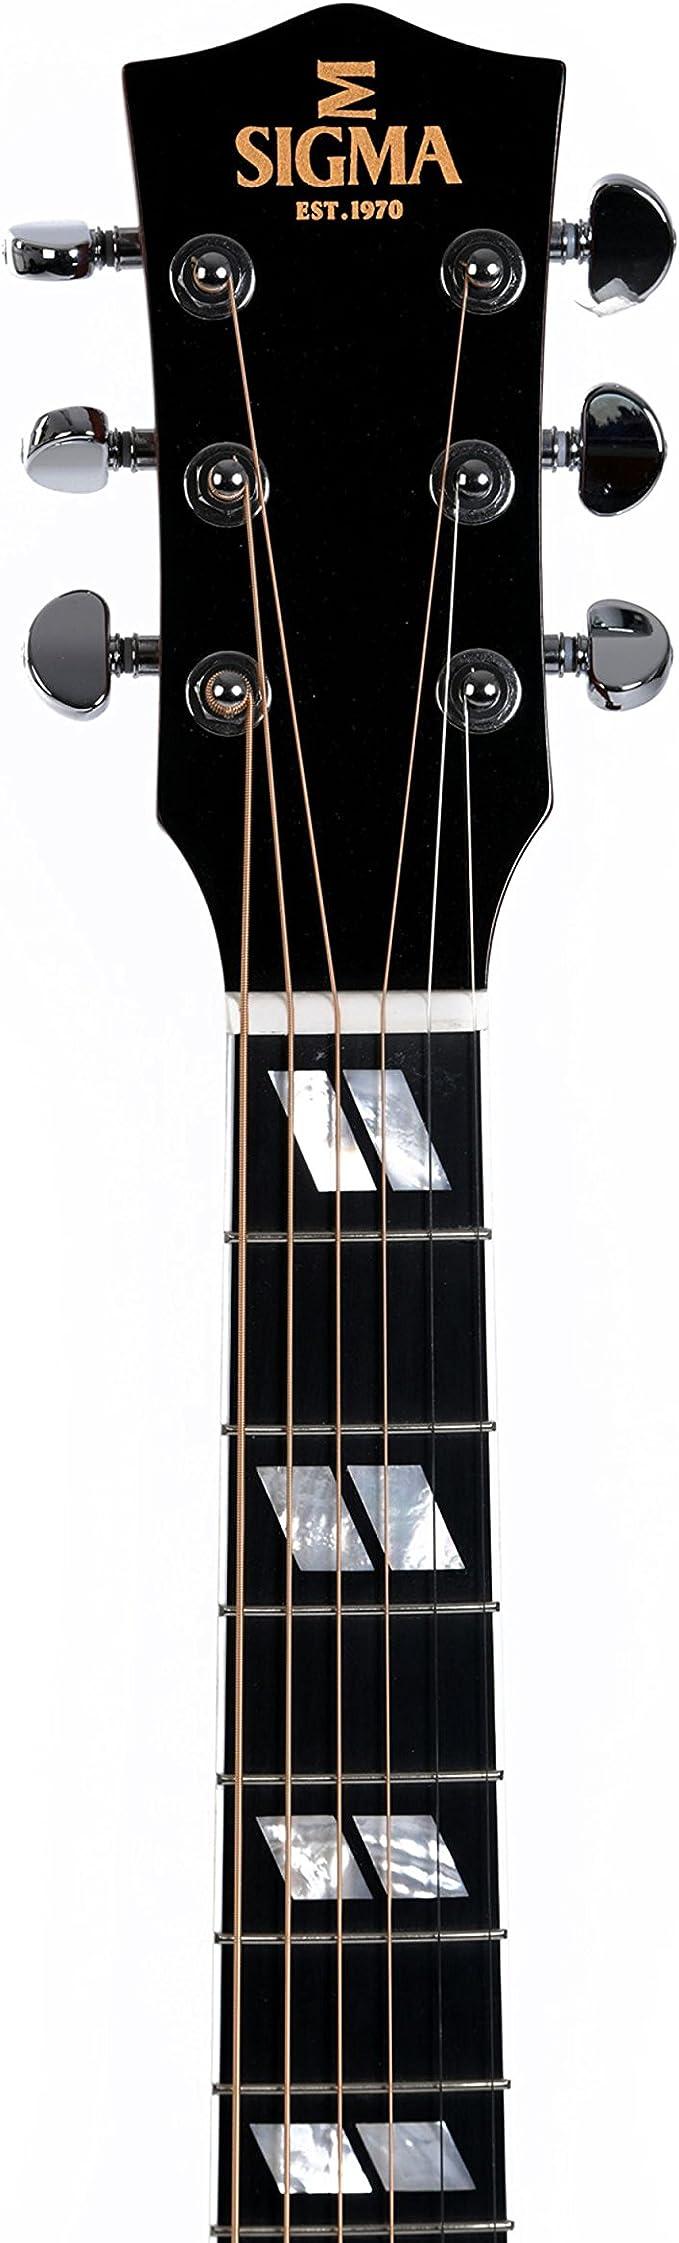 DM-SG5+: Amazon.es: Instrumentos musicales